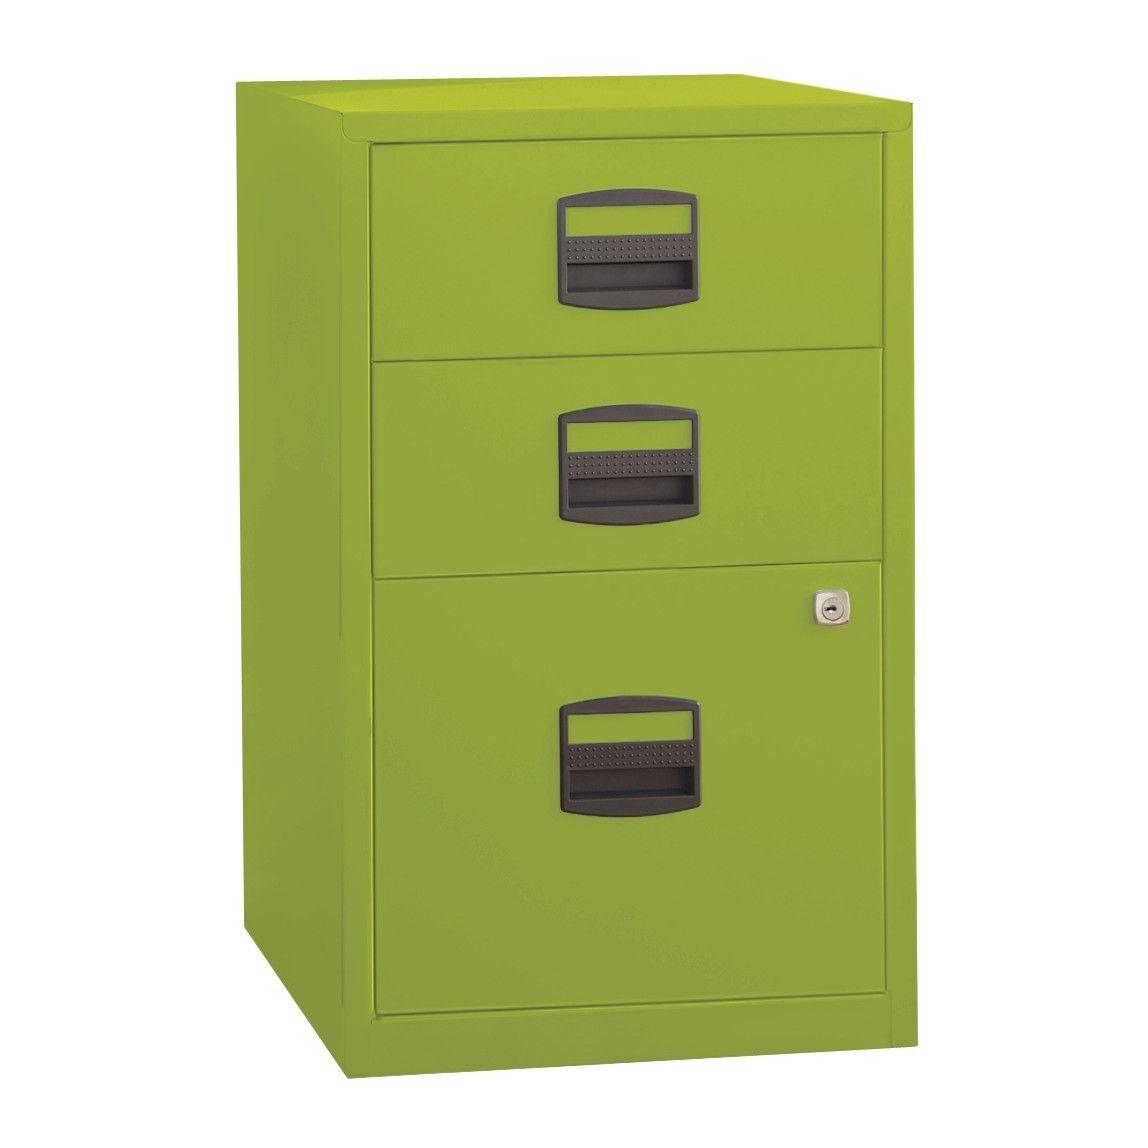 Unique Metal File Dividers for Filing Cabinet